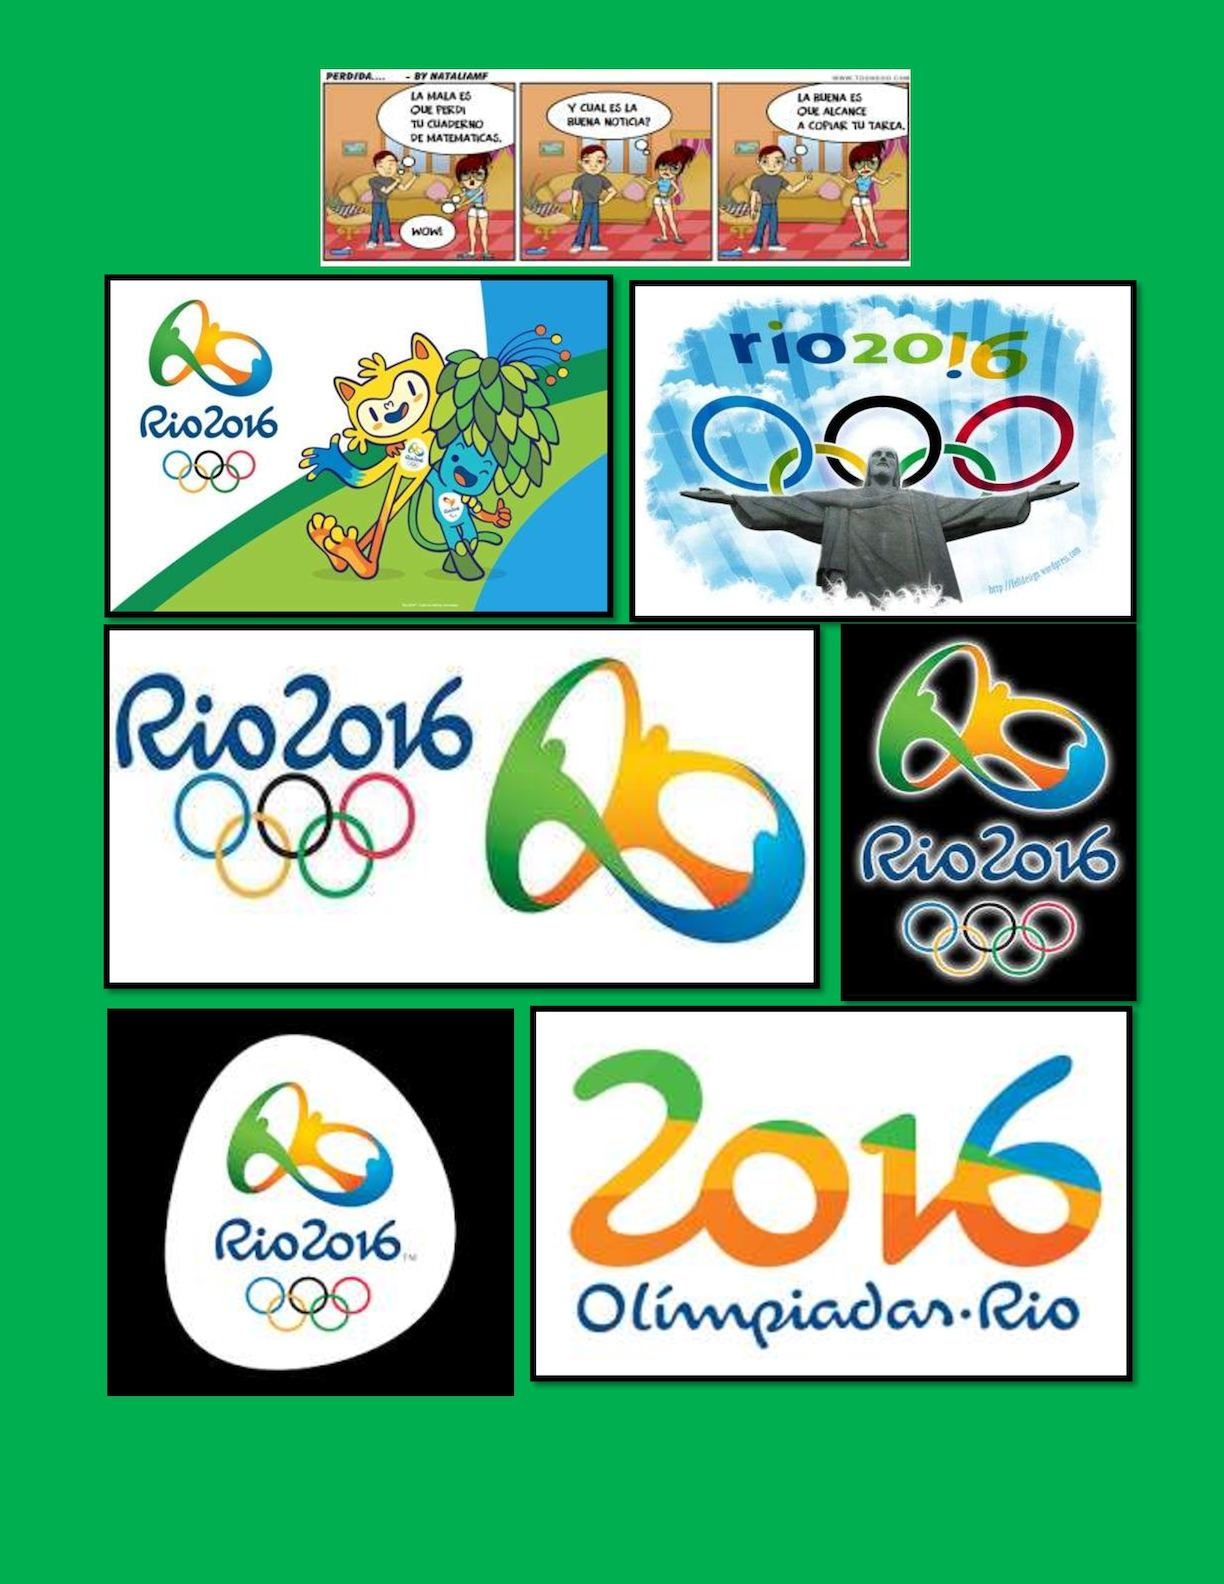 2cbb5fb7216b9 Calaméo - Juegos Olimpicos rio 2016